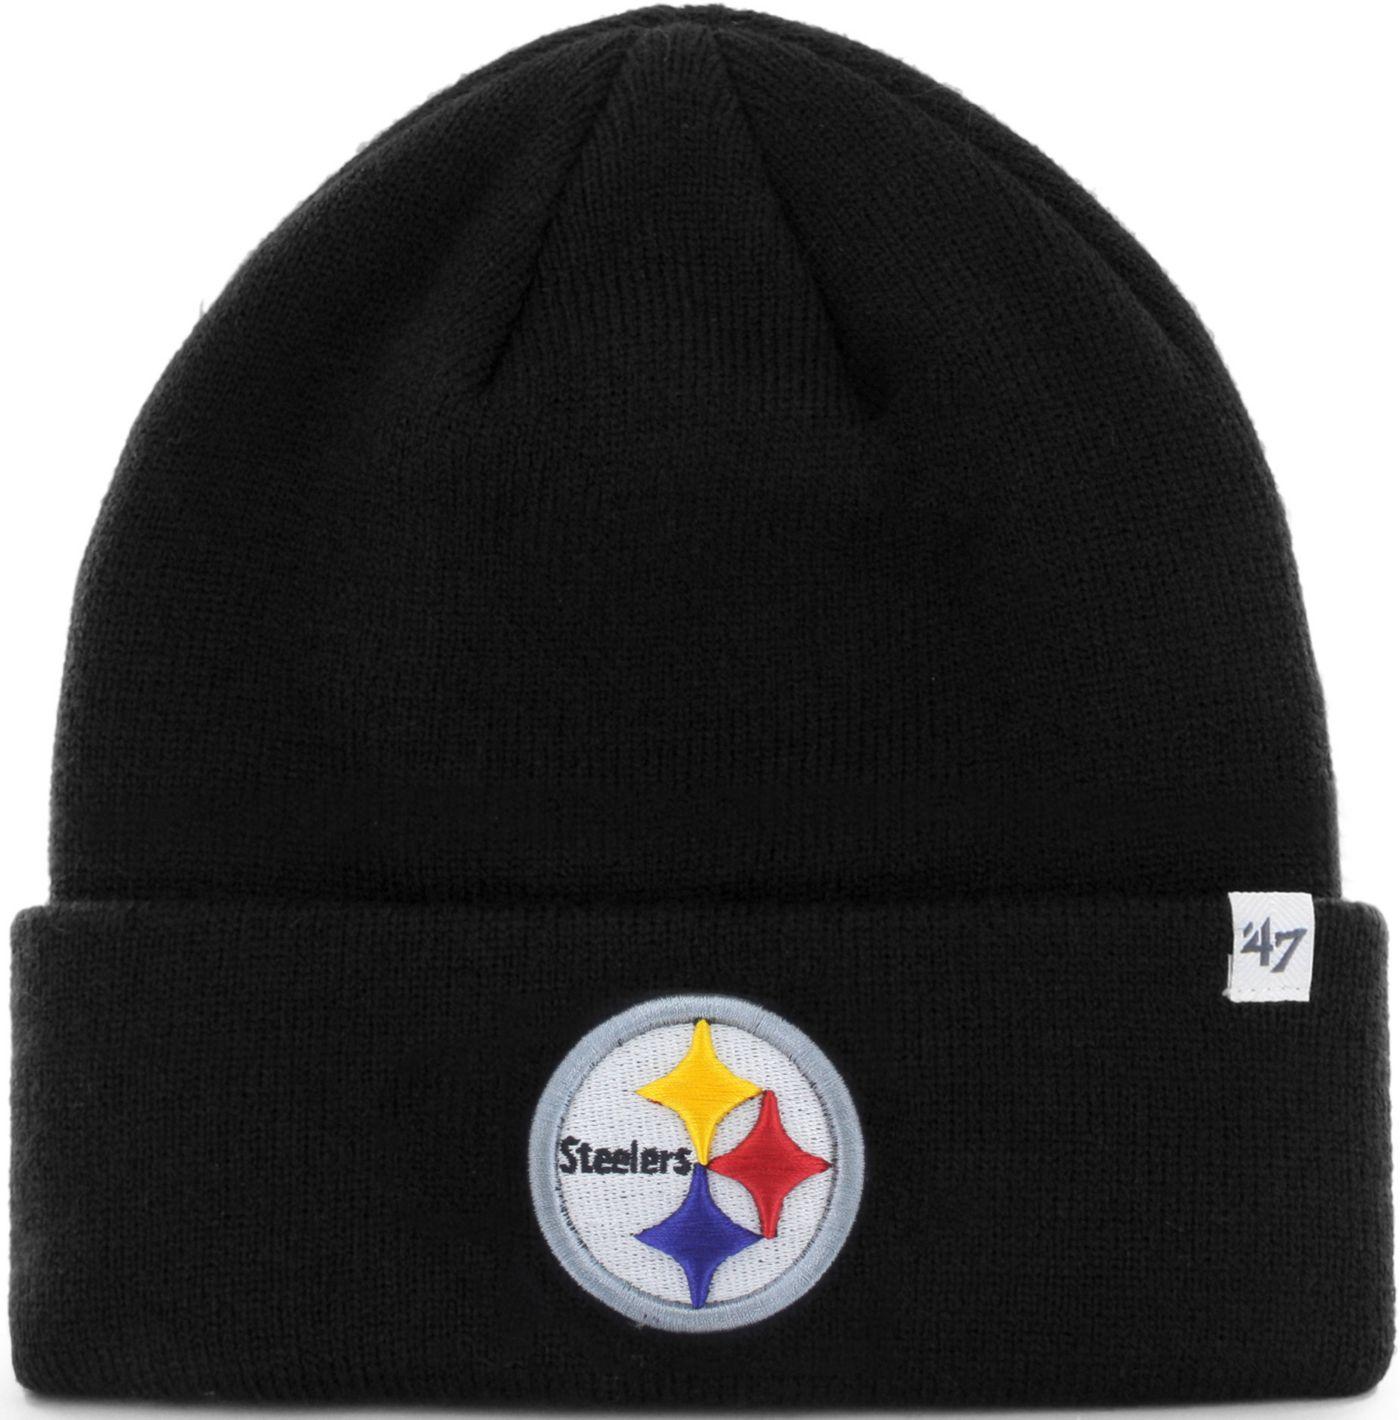 '47 Men's Pittsburgh Steelers Basic Black Cuffed Knit Beanie